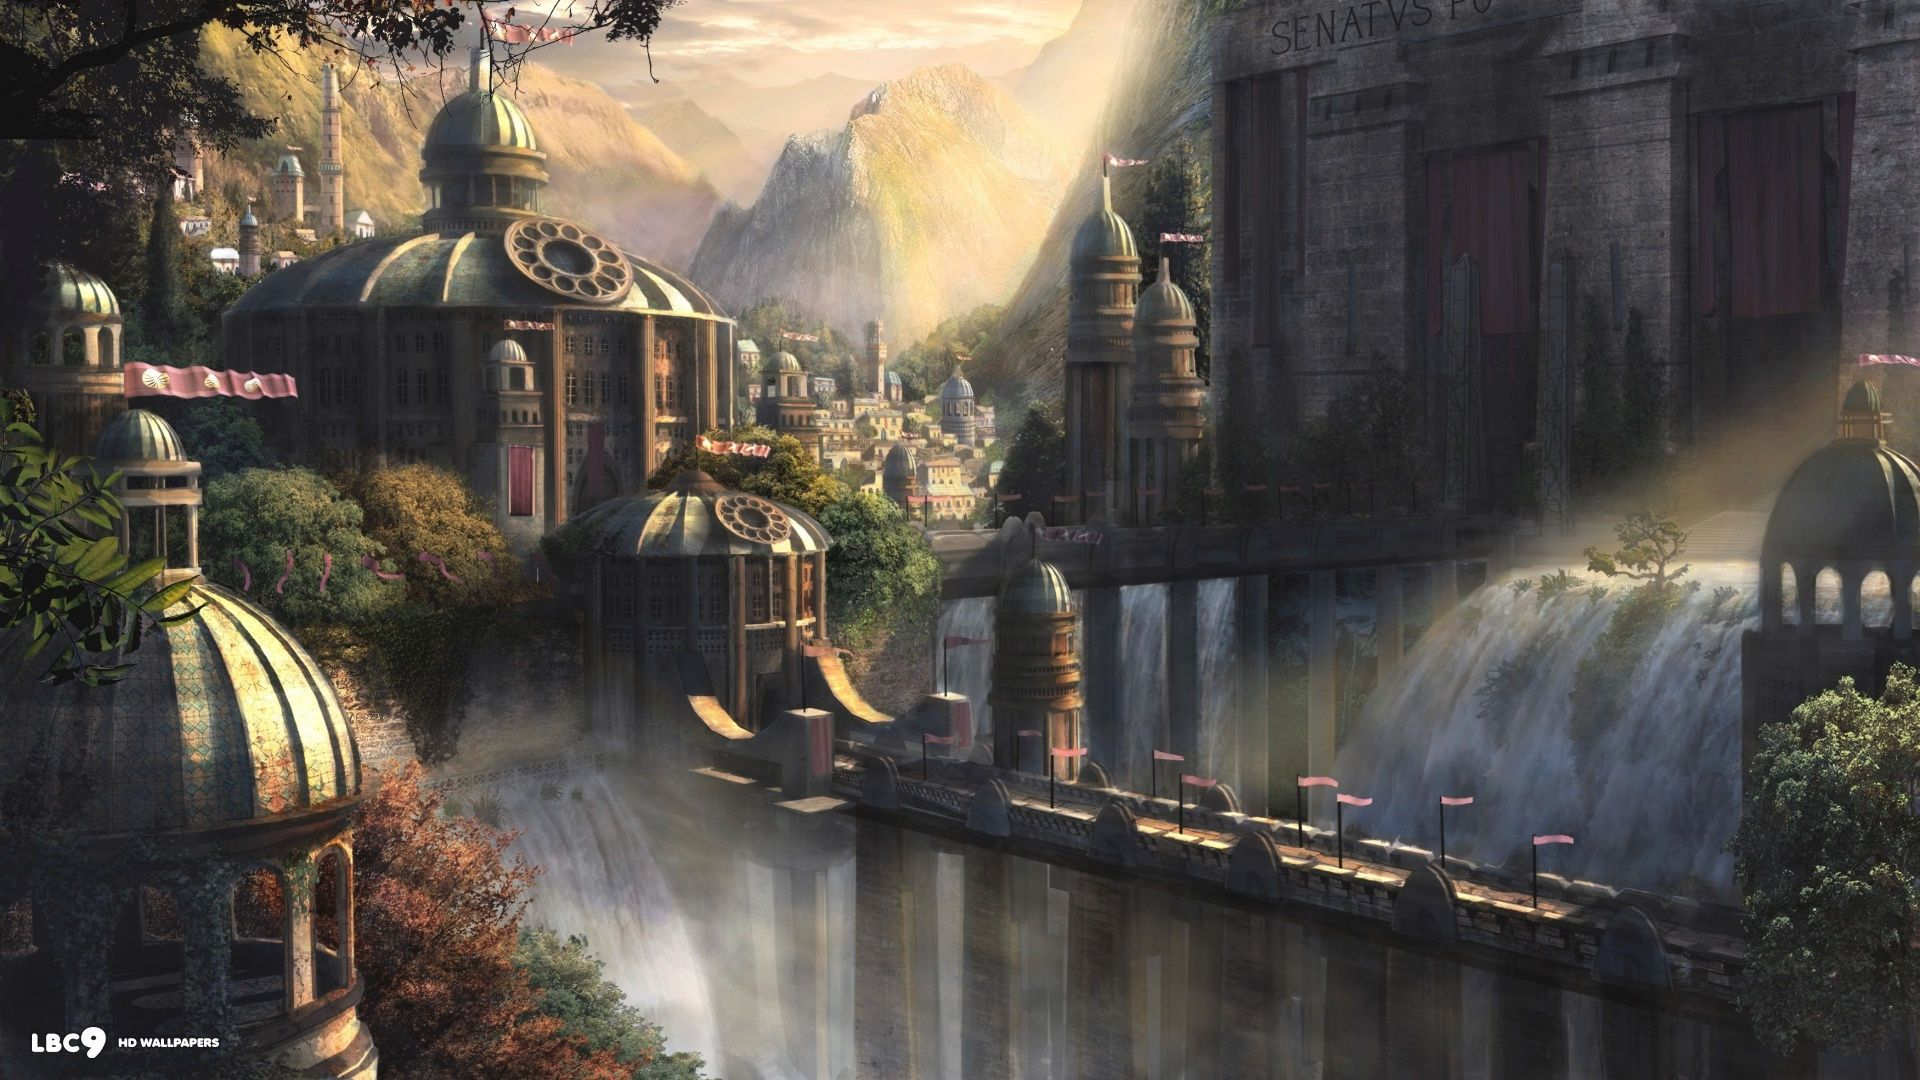 Fantasy Castle Desktop Wallpaper Your Hd xPX Wallpaper ...